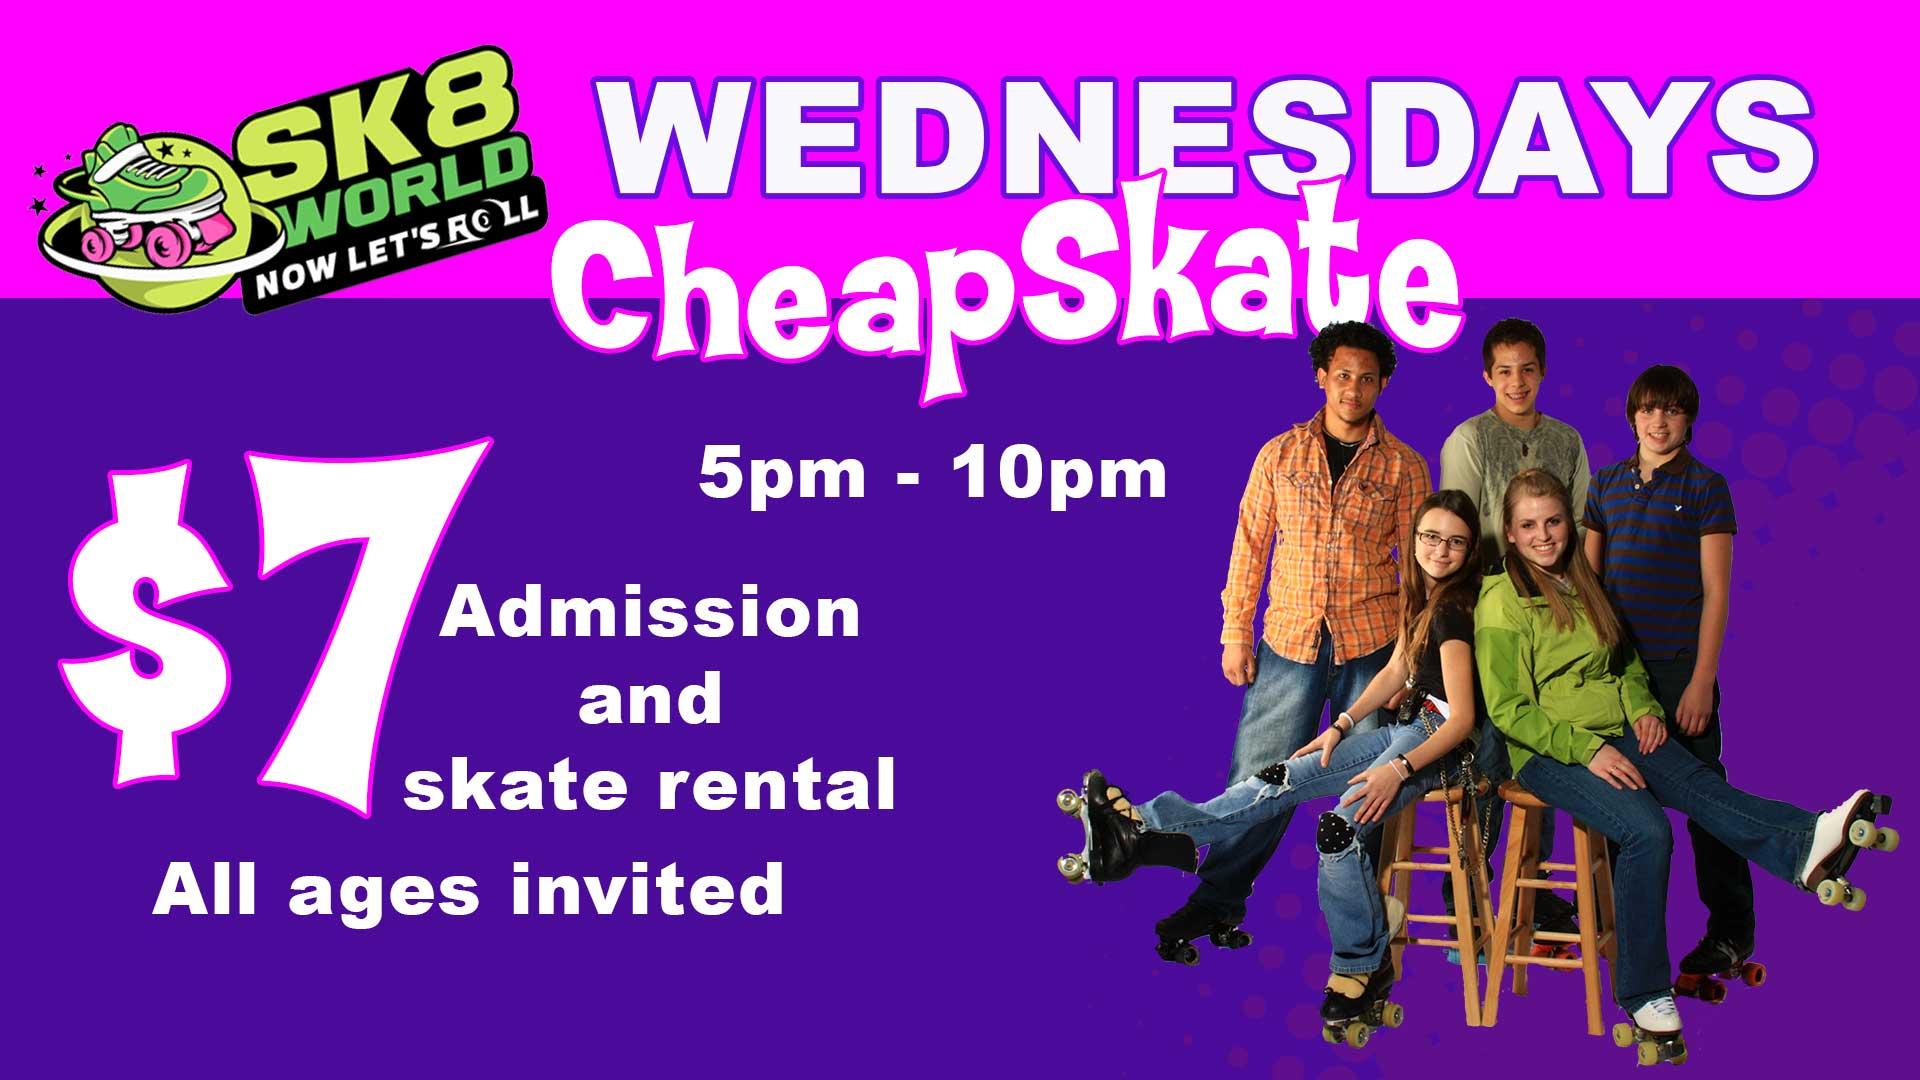 Roller Skate at Sk8world Portage for $7 including skates on Wednesdays 5pm - 10pm